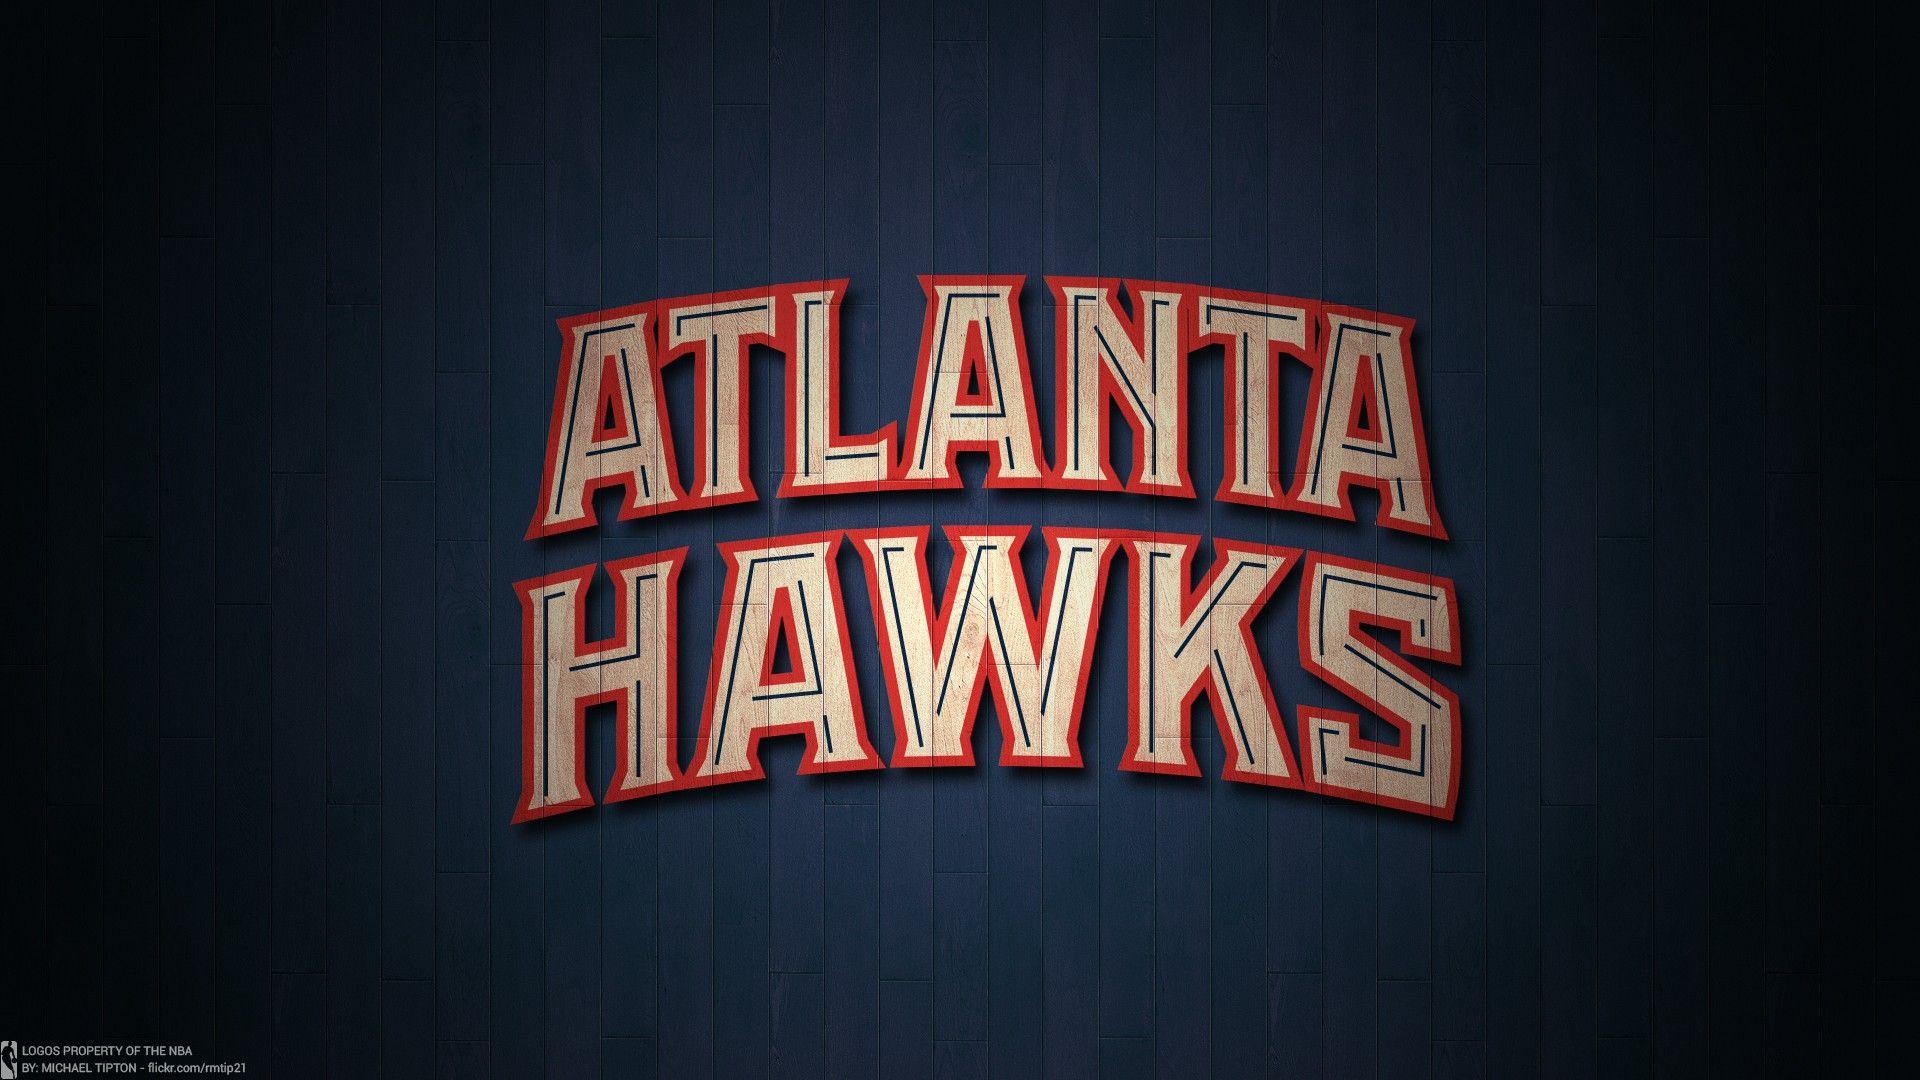 Atlanta Hawks Wallpaper 2021 Basketball Wallpaper Atlanta Hawks Basketball Wallpapers Hd Atlanta Falcons Wallpaper